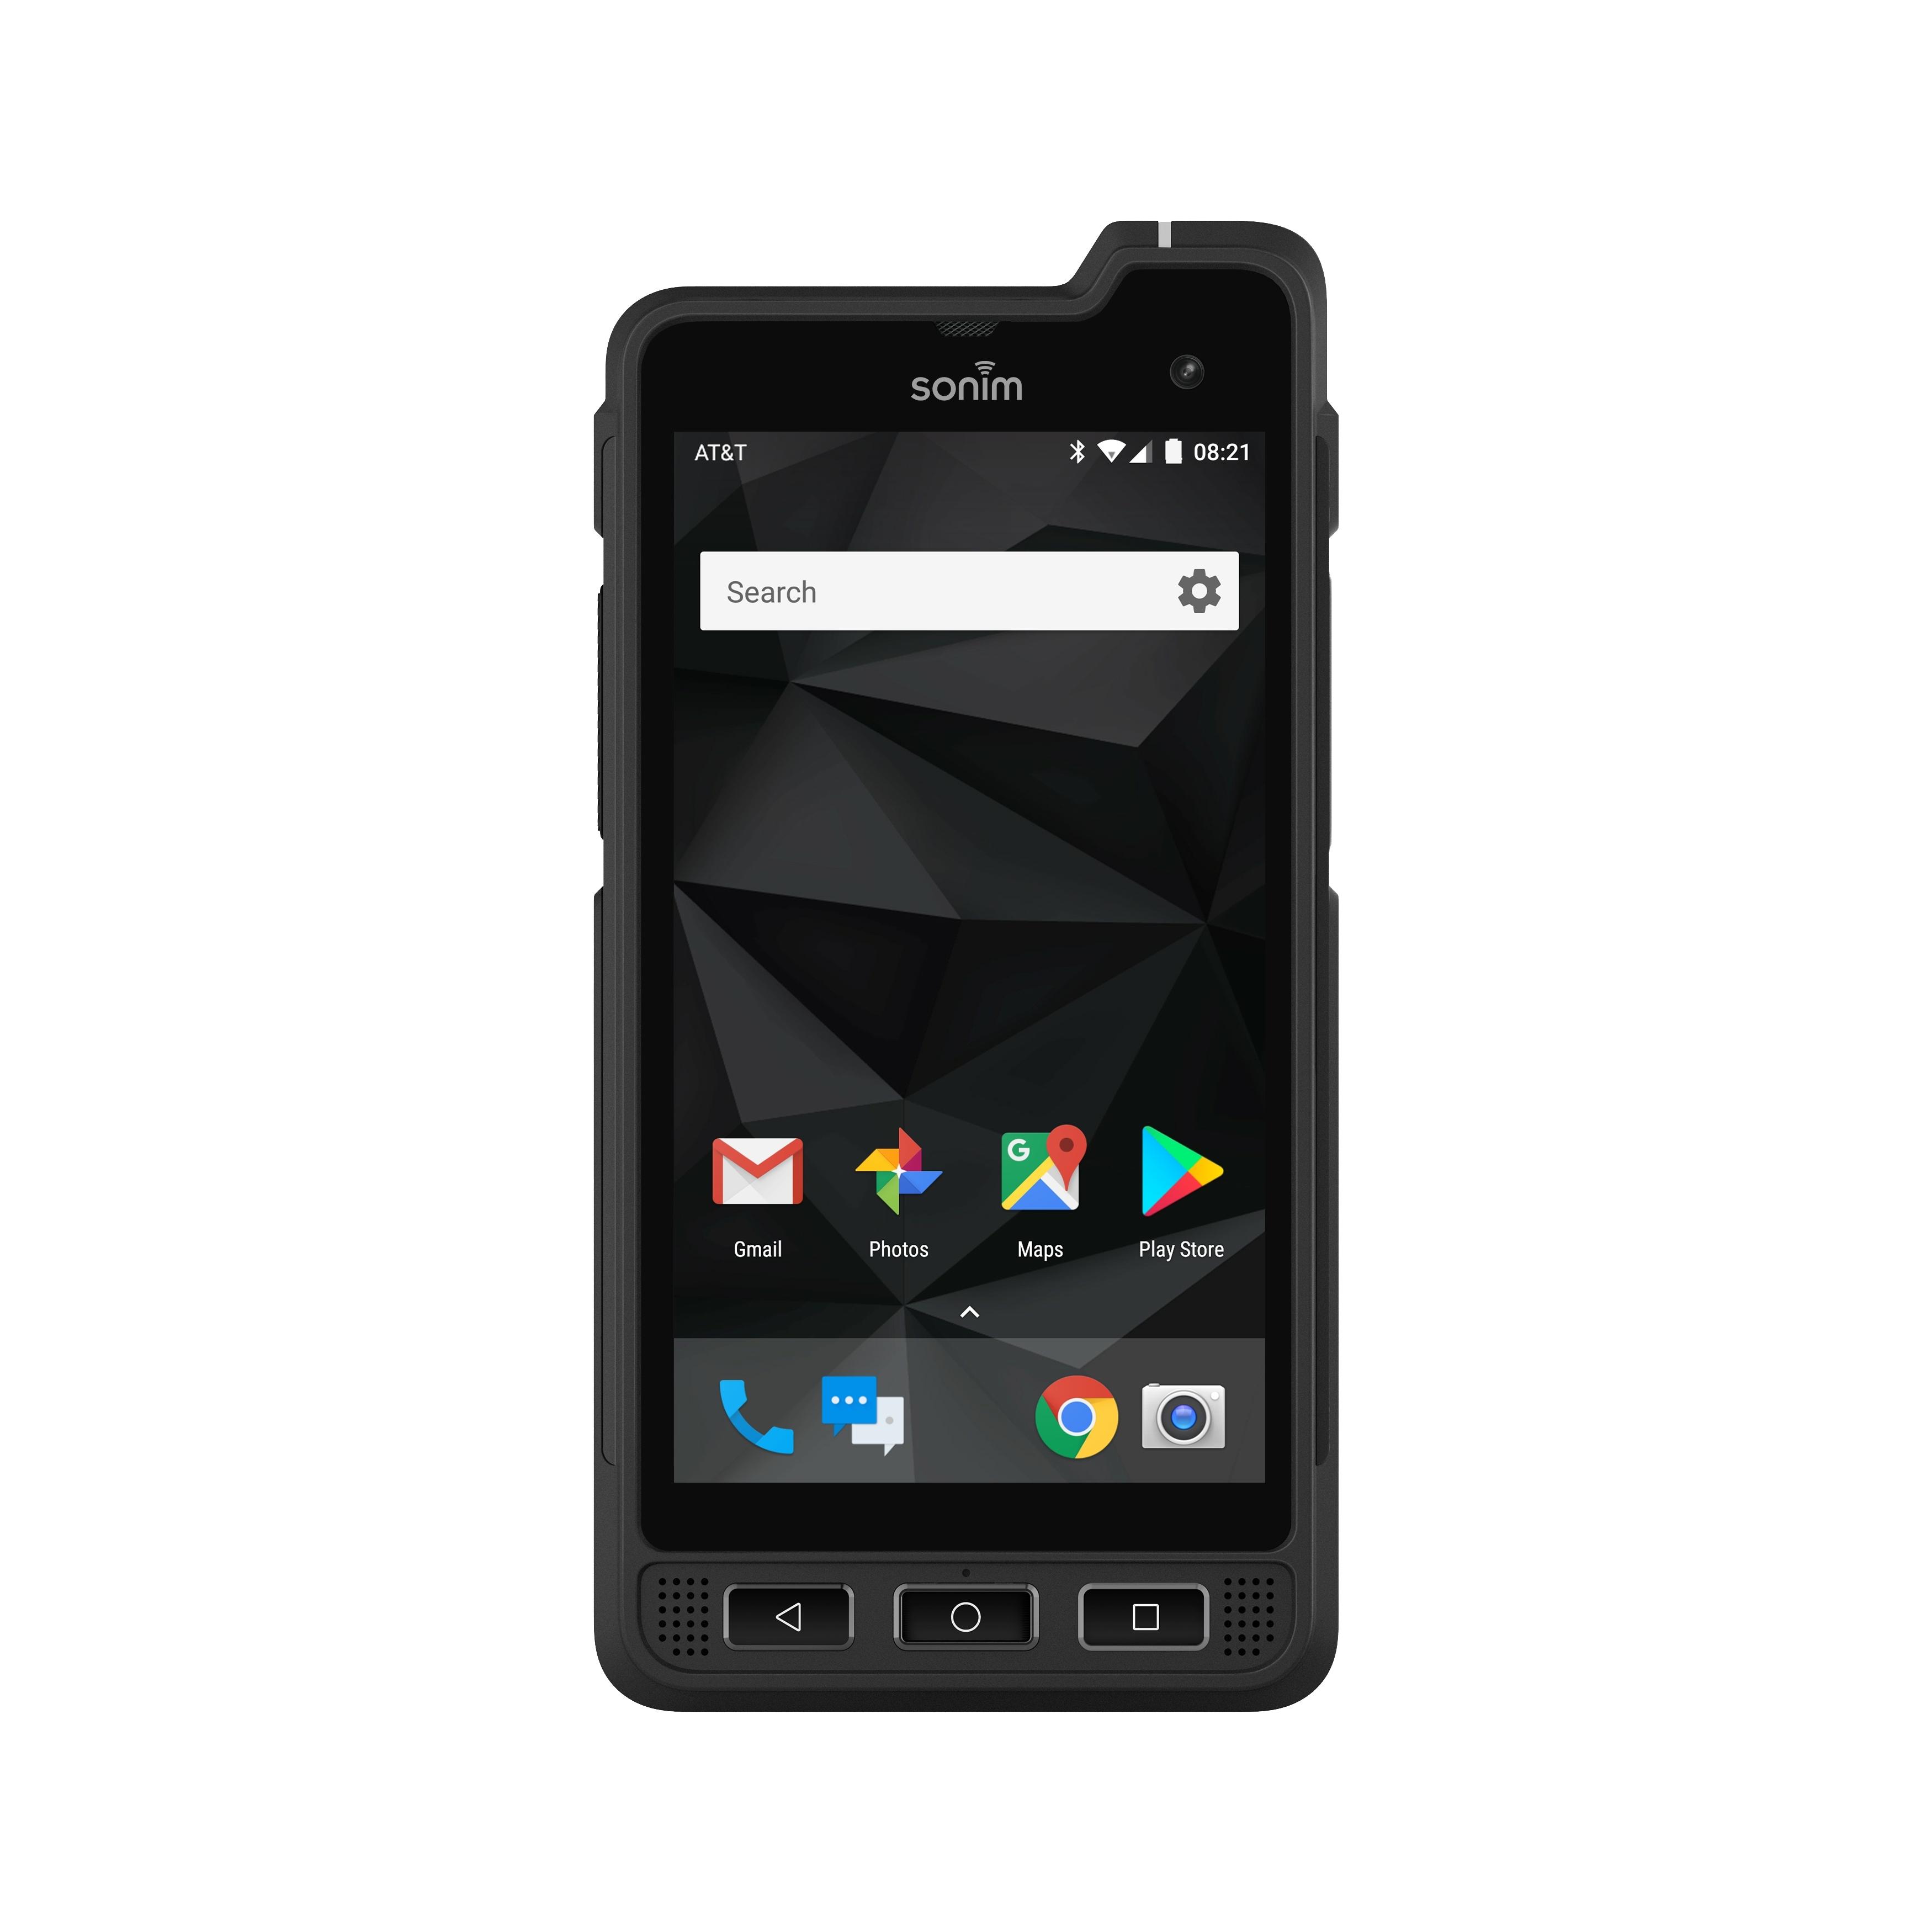 rug cell phones rugged integrated smartphone waterproof p cat flir with unlocked camera